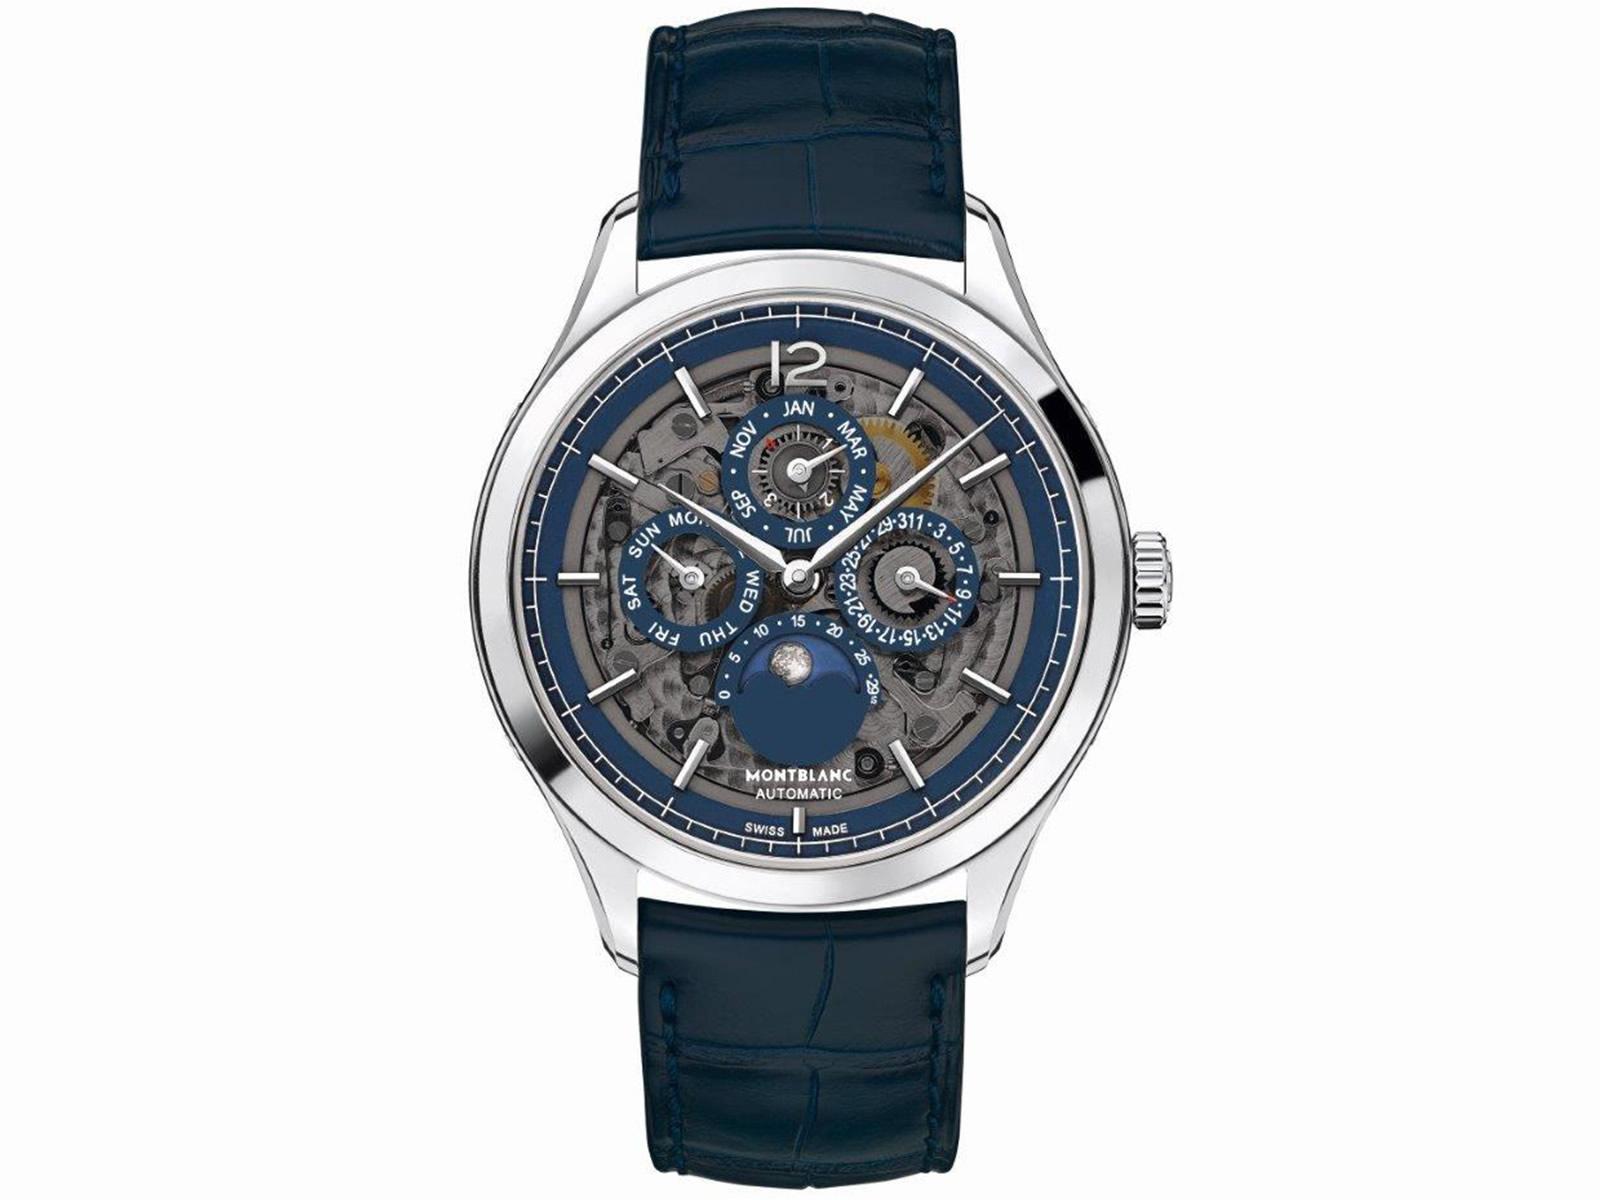 118513-montblanc-heritage-chronometrie-perpetual-calendar-sapphire-1-.jpg